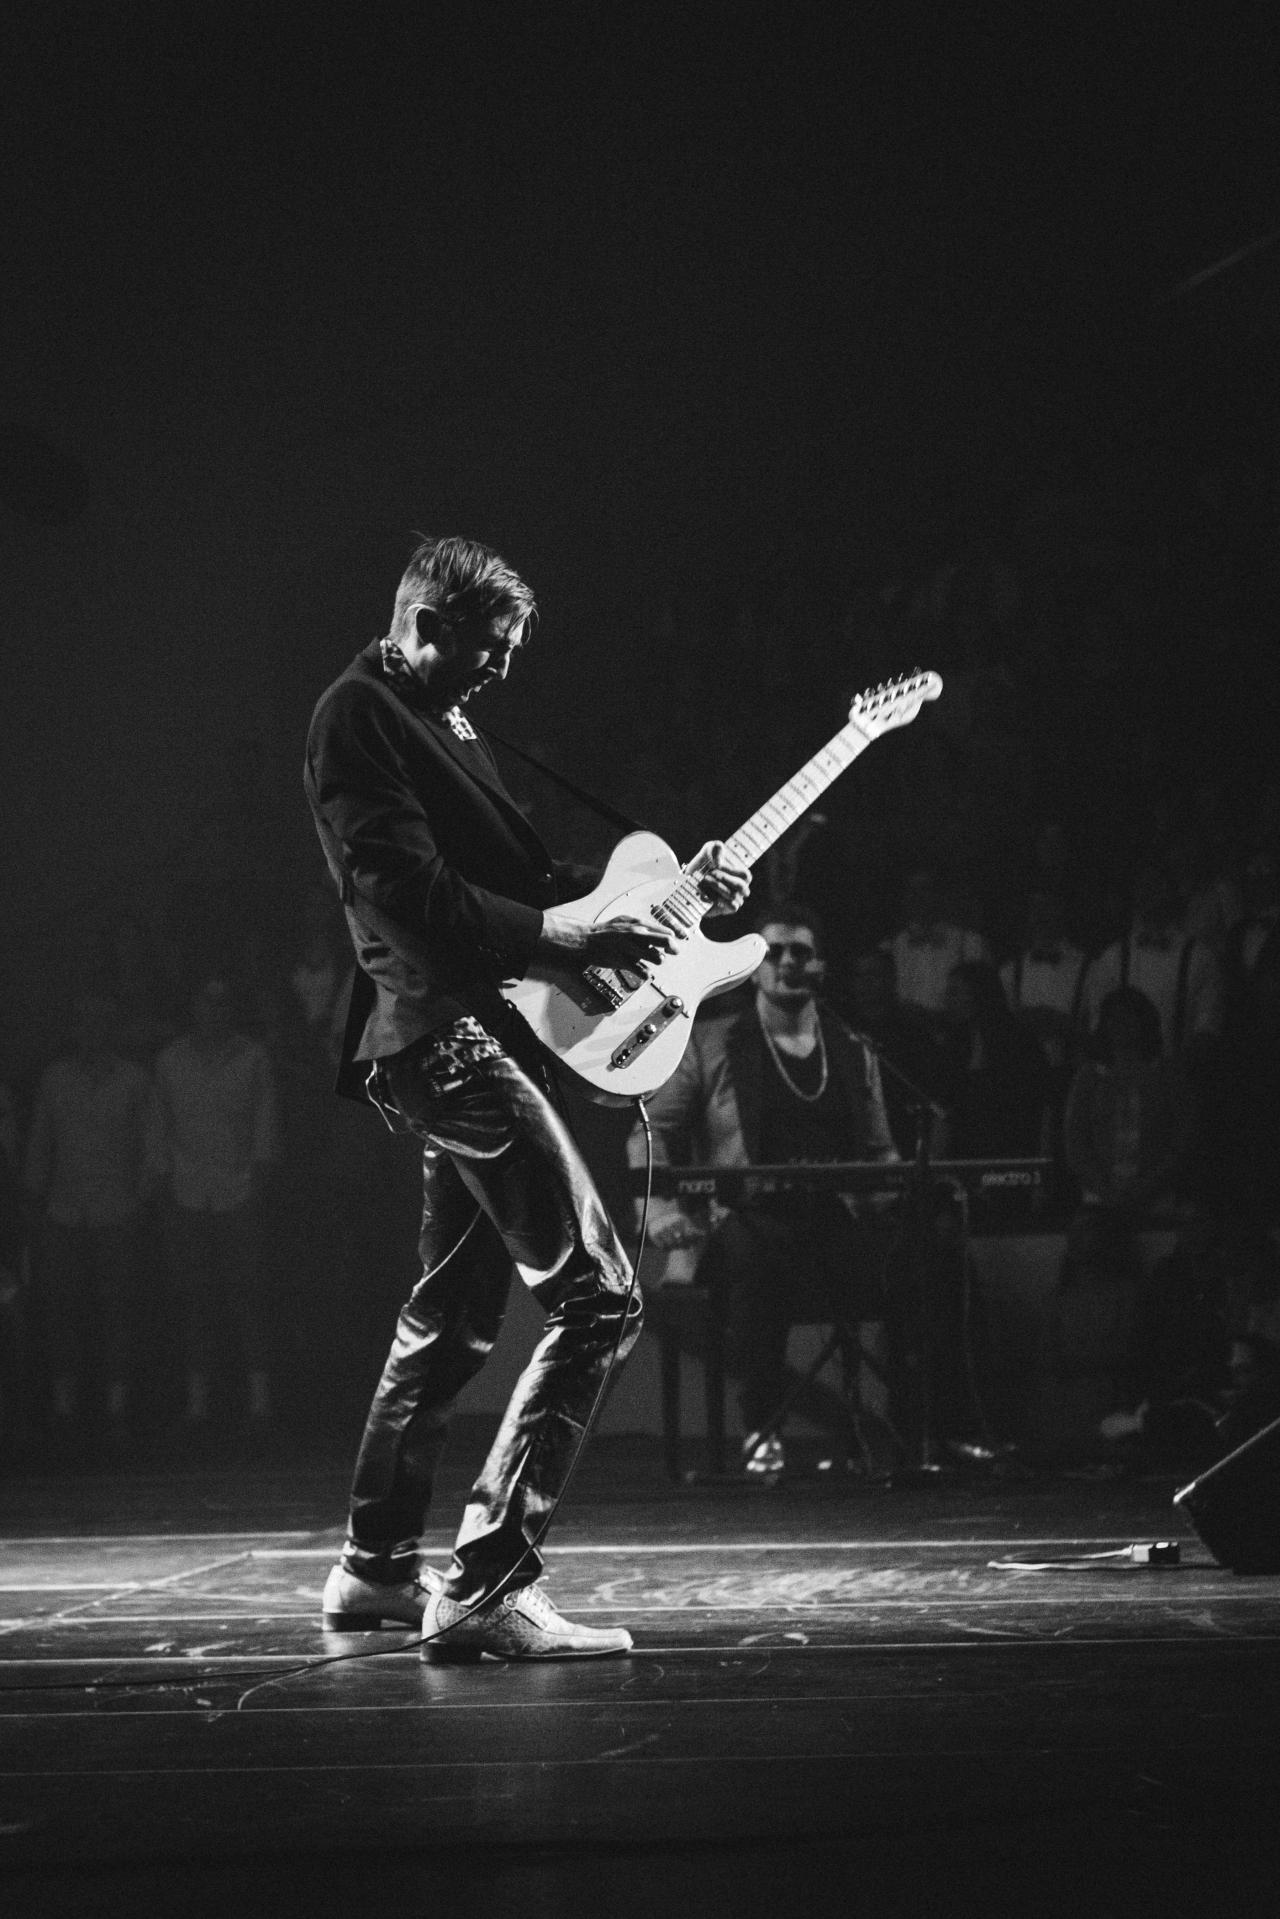 musician-guitar-rock-star-performance-id9098-1280x1920